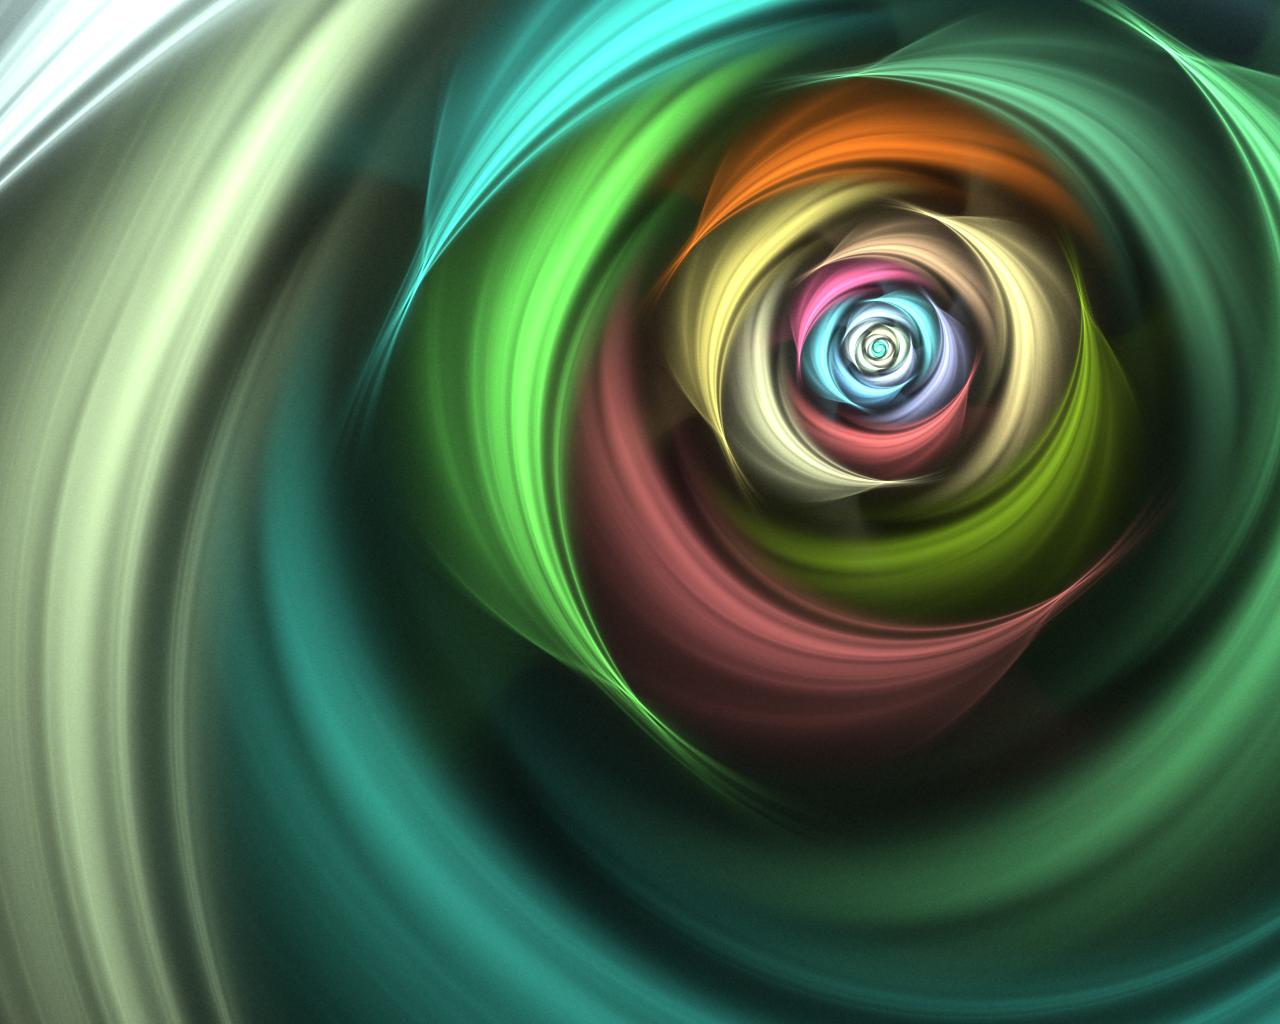 spiral rainbow - photo #42